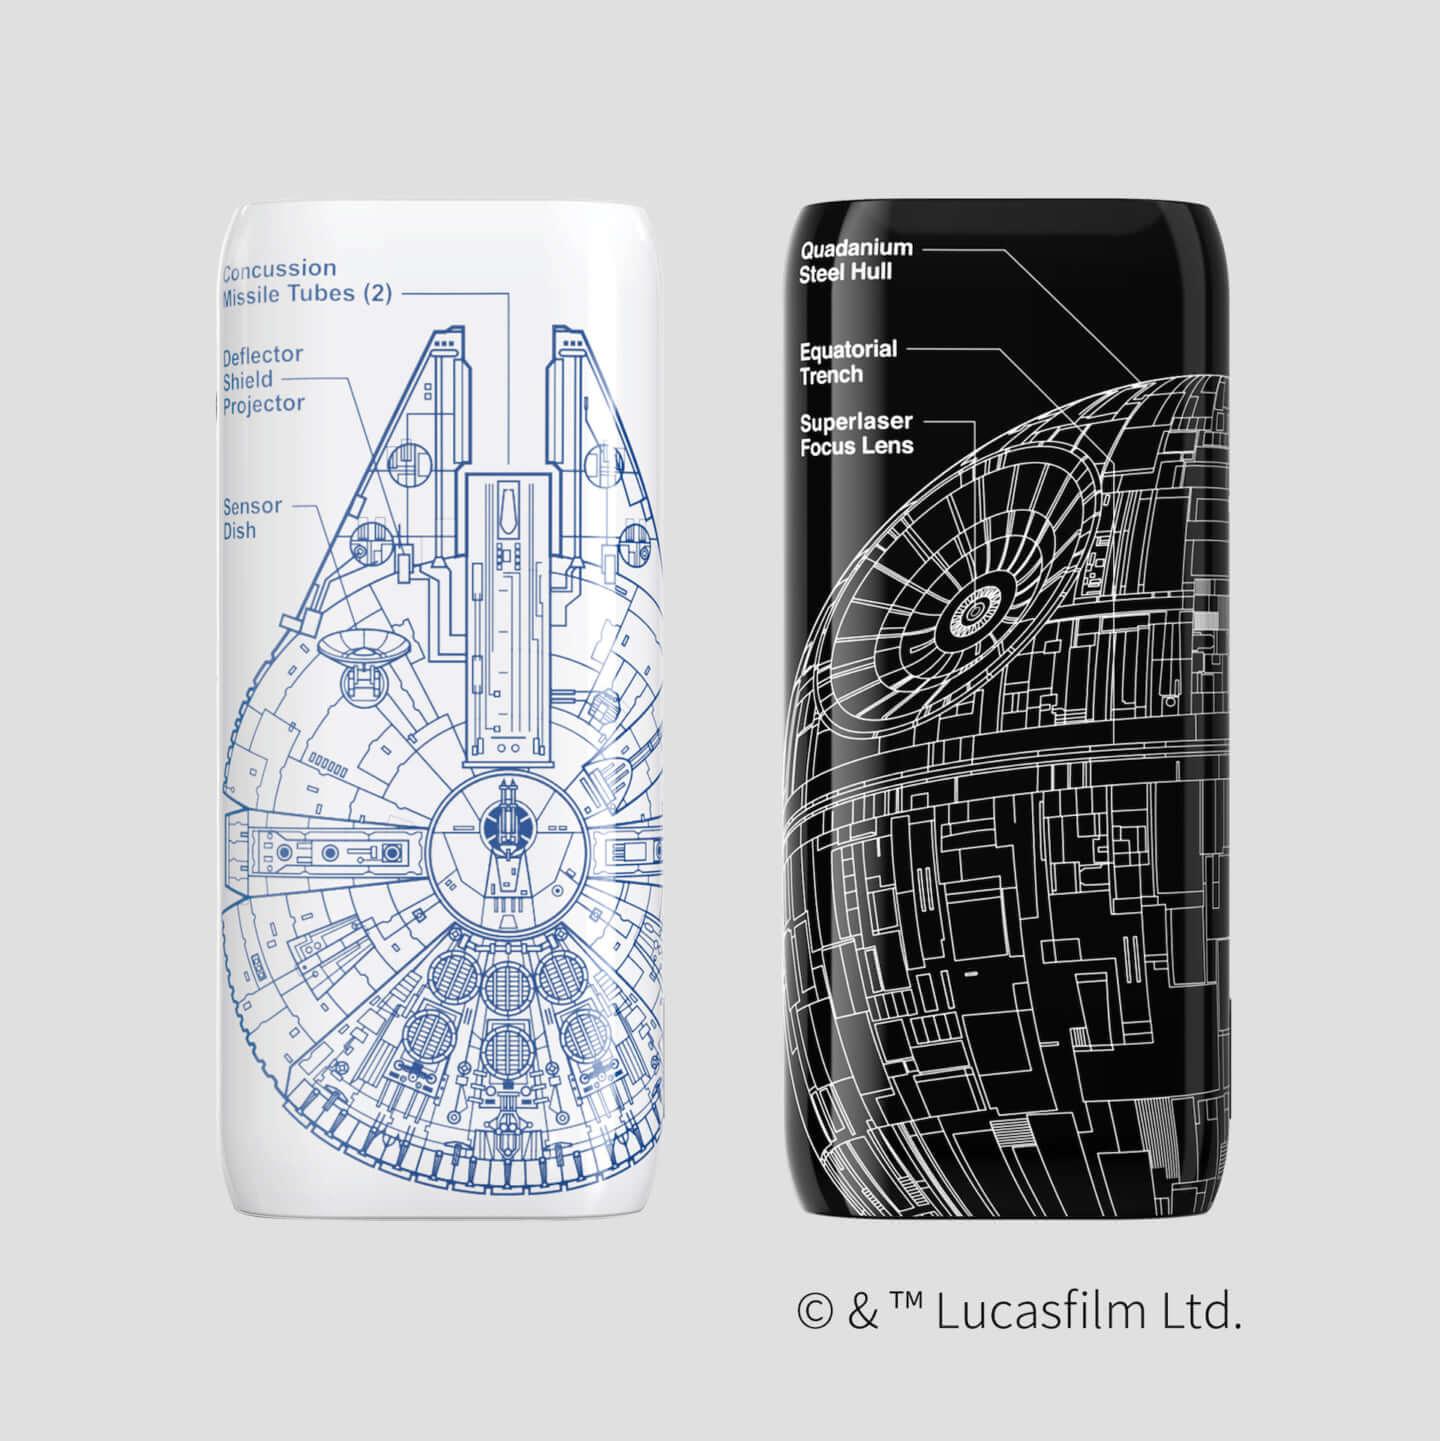 R2-D2にミレニアム・ファルコンも!『スター・ウォーズ』の世界観を楽しめるモバイルバッテリー2種類とプロジェクターがAnkerから登場 tech191120_starwars_mobile_01-1440x1441